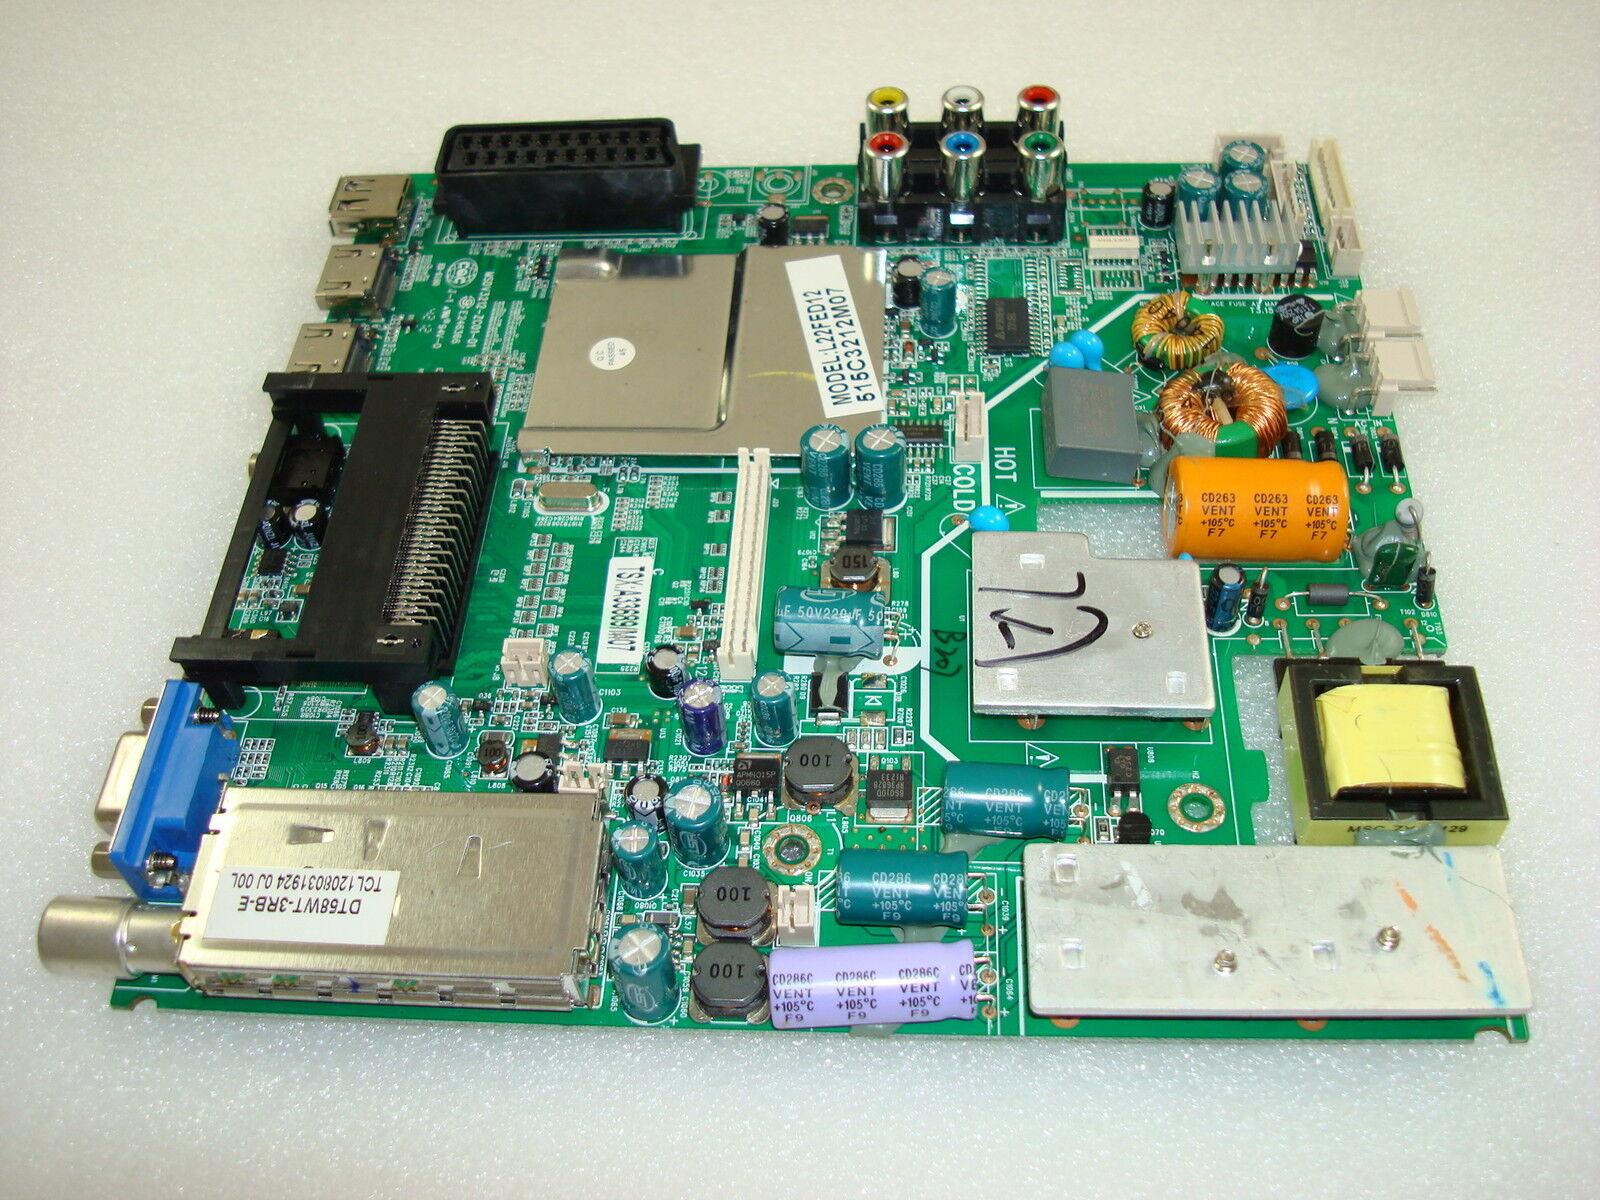 Logik L22fed12 Power Supply Main Av Pcb Msdv3212 Zc01 01 As Well Samsung Tv Circuit Board Schematic Also Philips 515c3212m07 Ebay